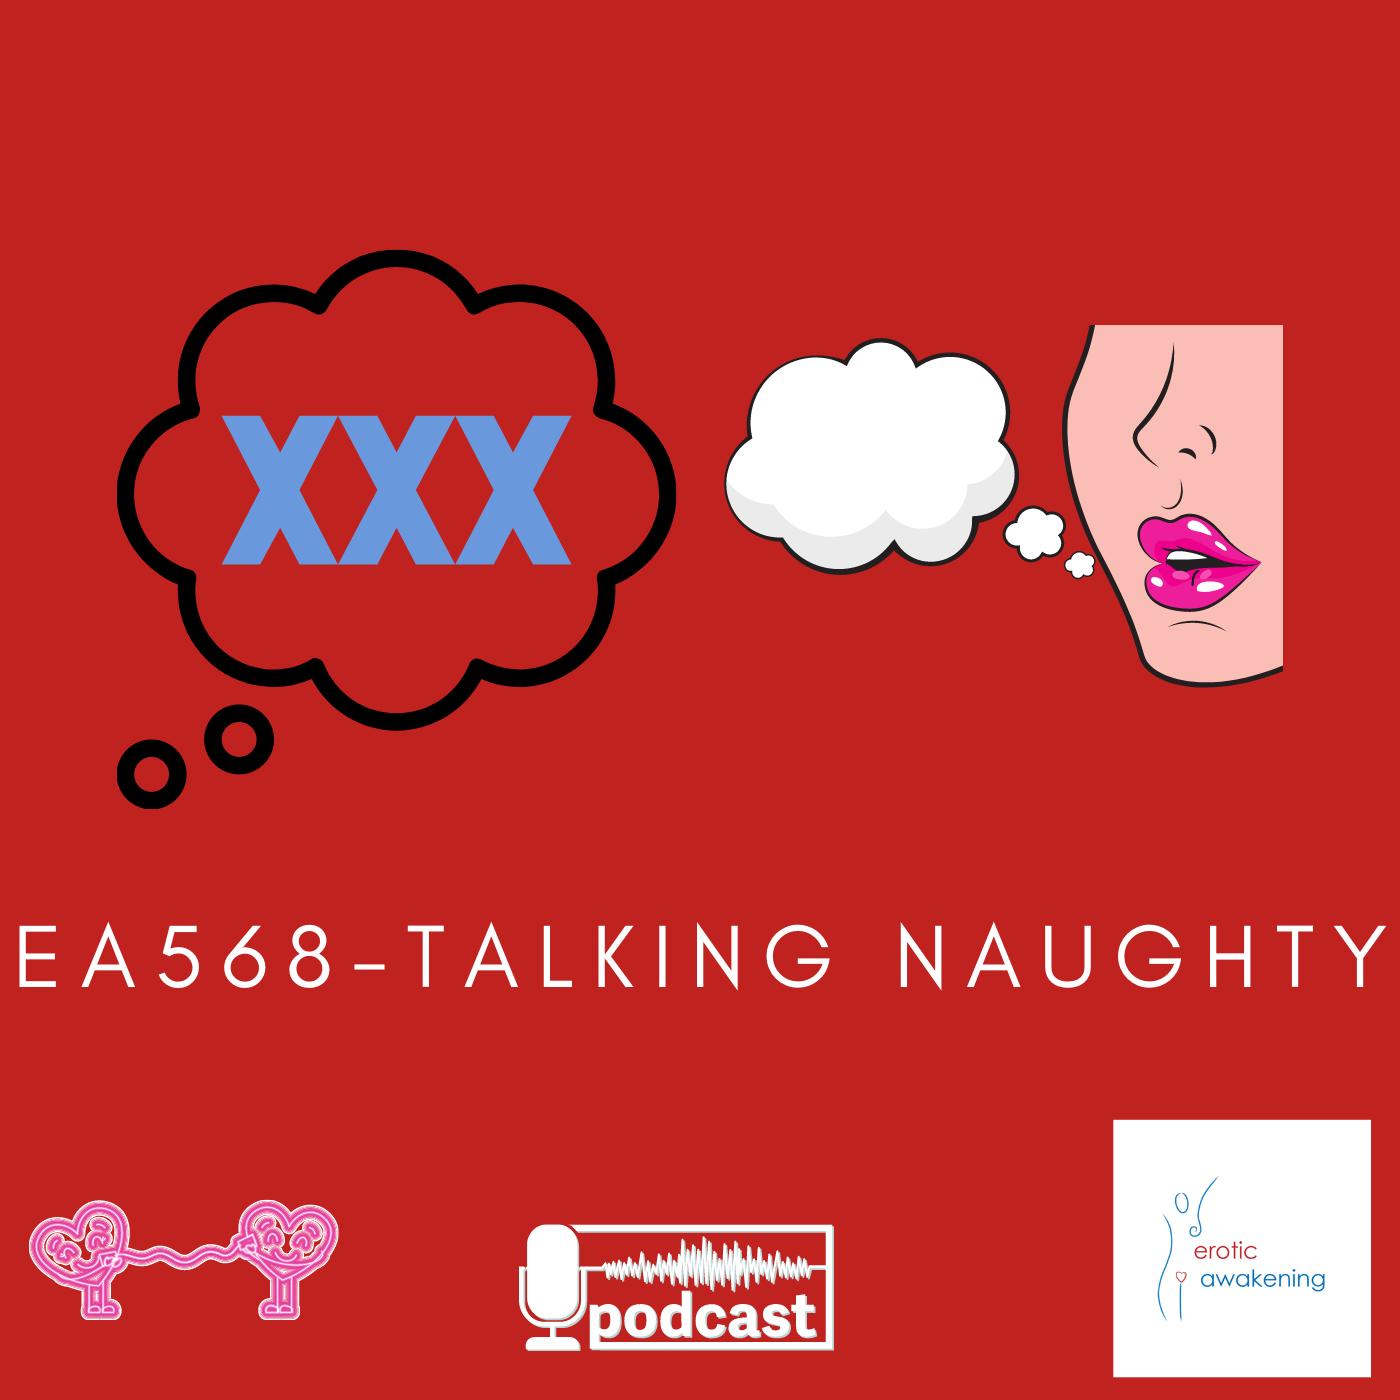 Erotic Awakening Podcast - EA568 - Talking Naughty